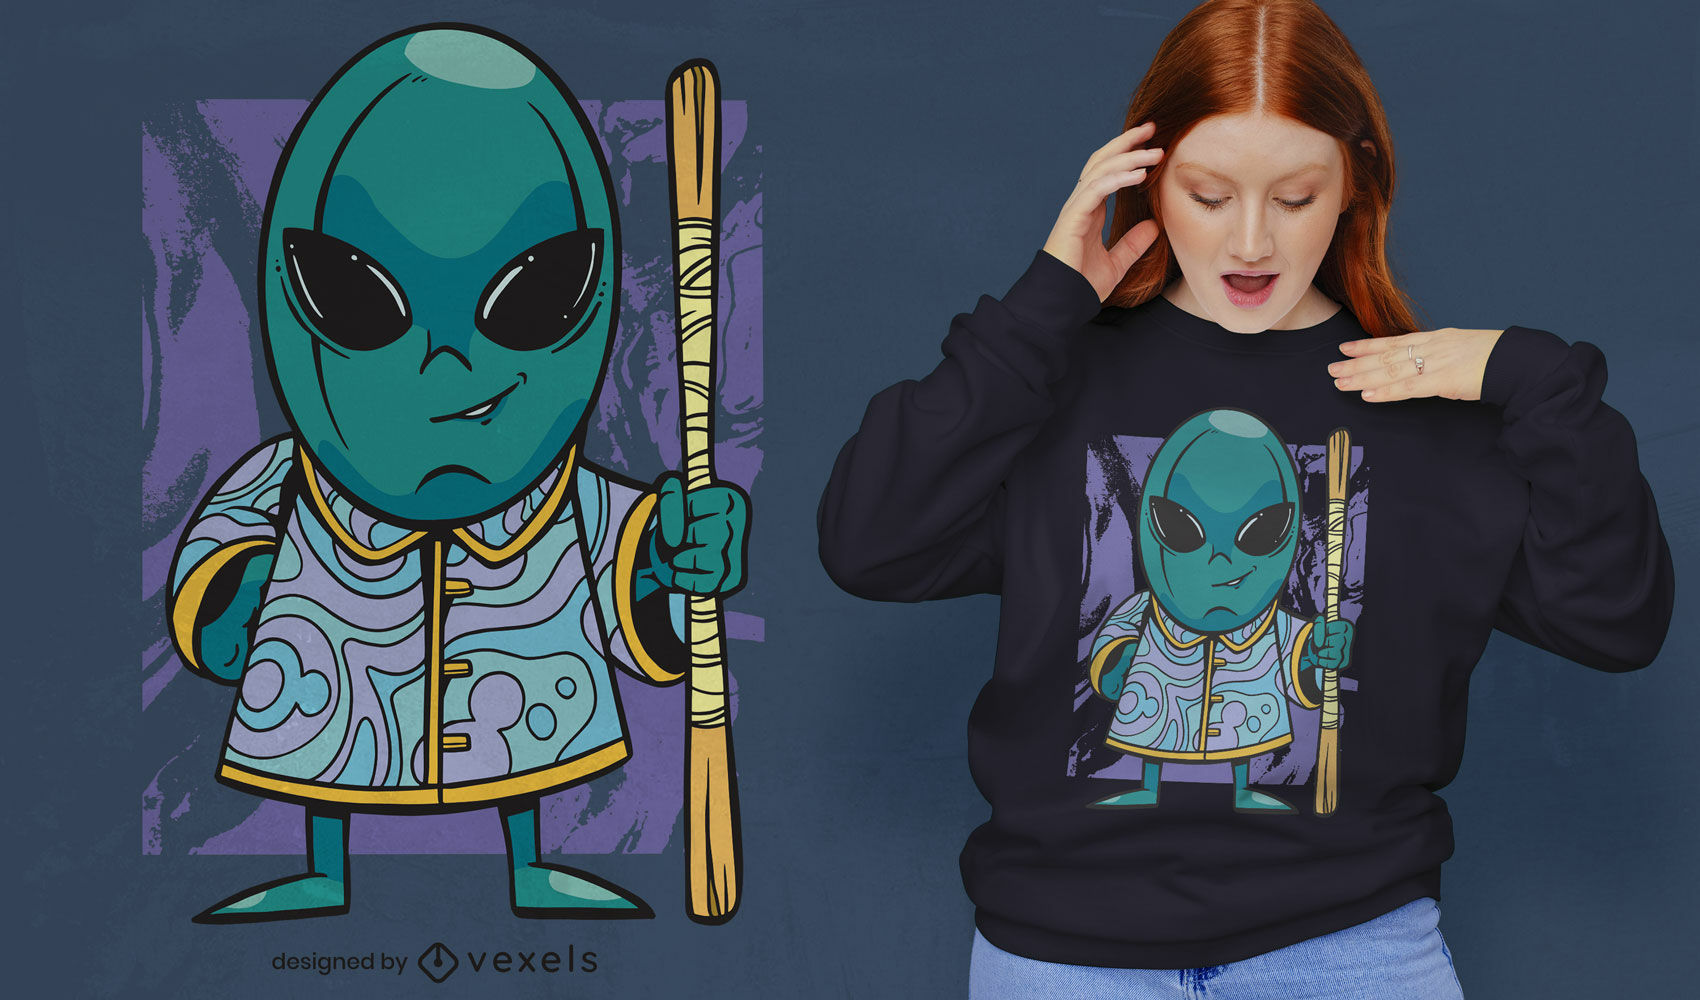 Diseño de camiseta de monje alienígena de dibujos animados